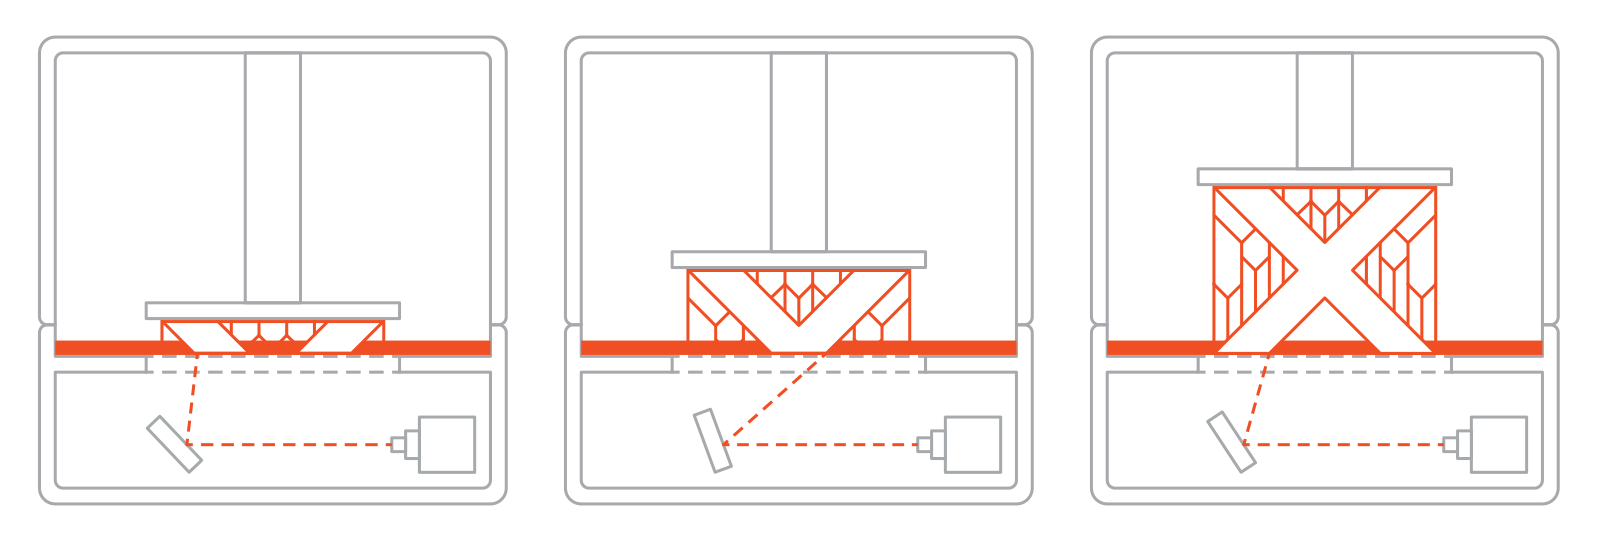 Introduction to SLA 3D Printing | 3D Hubs